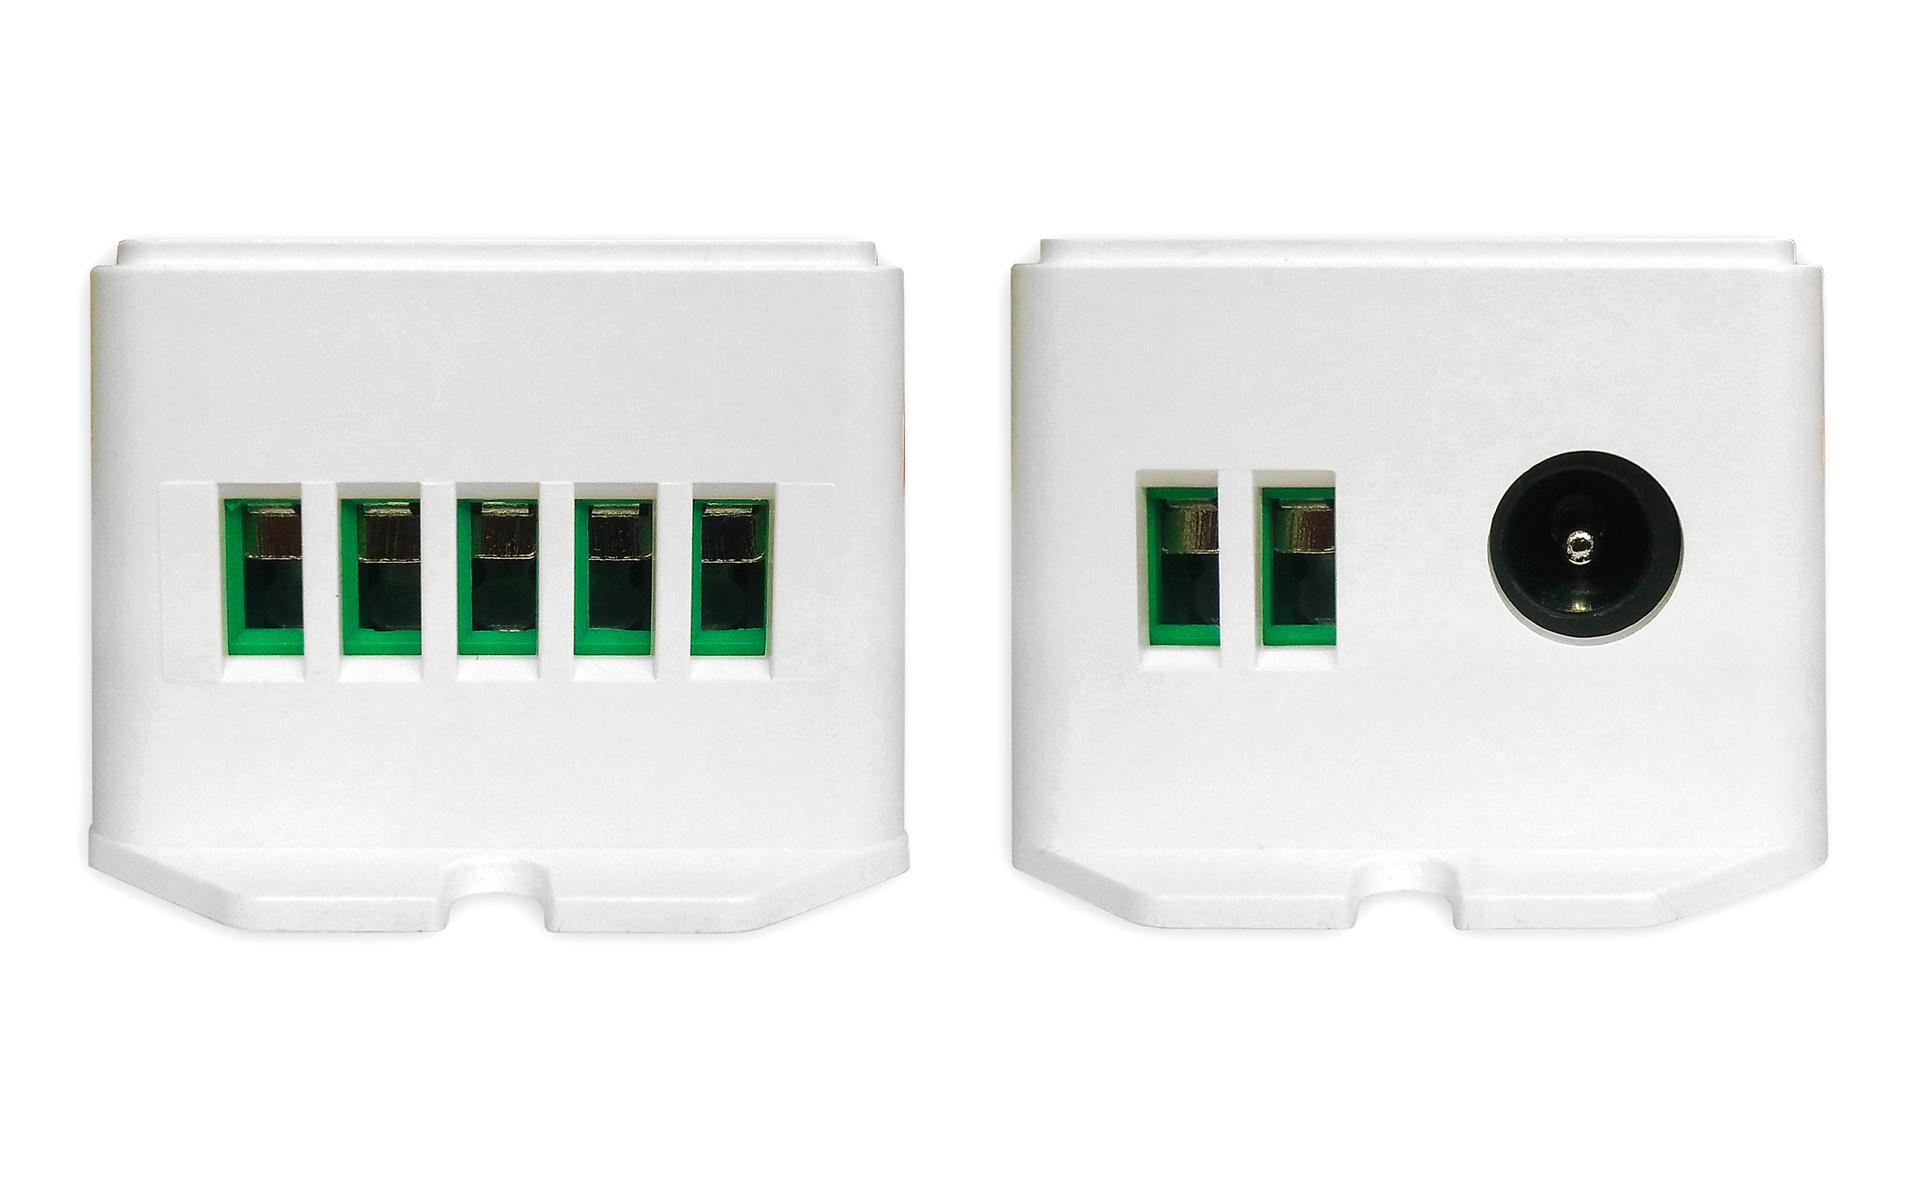 MiLight RGBW LED Strip Controller  12-24V, 15A (los)